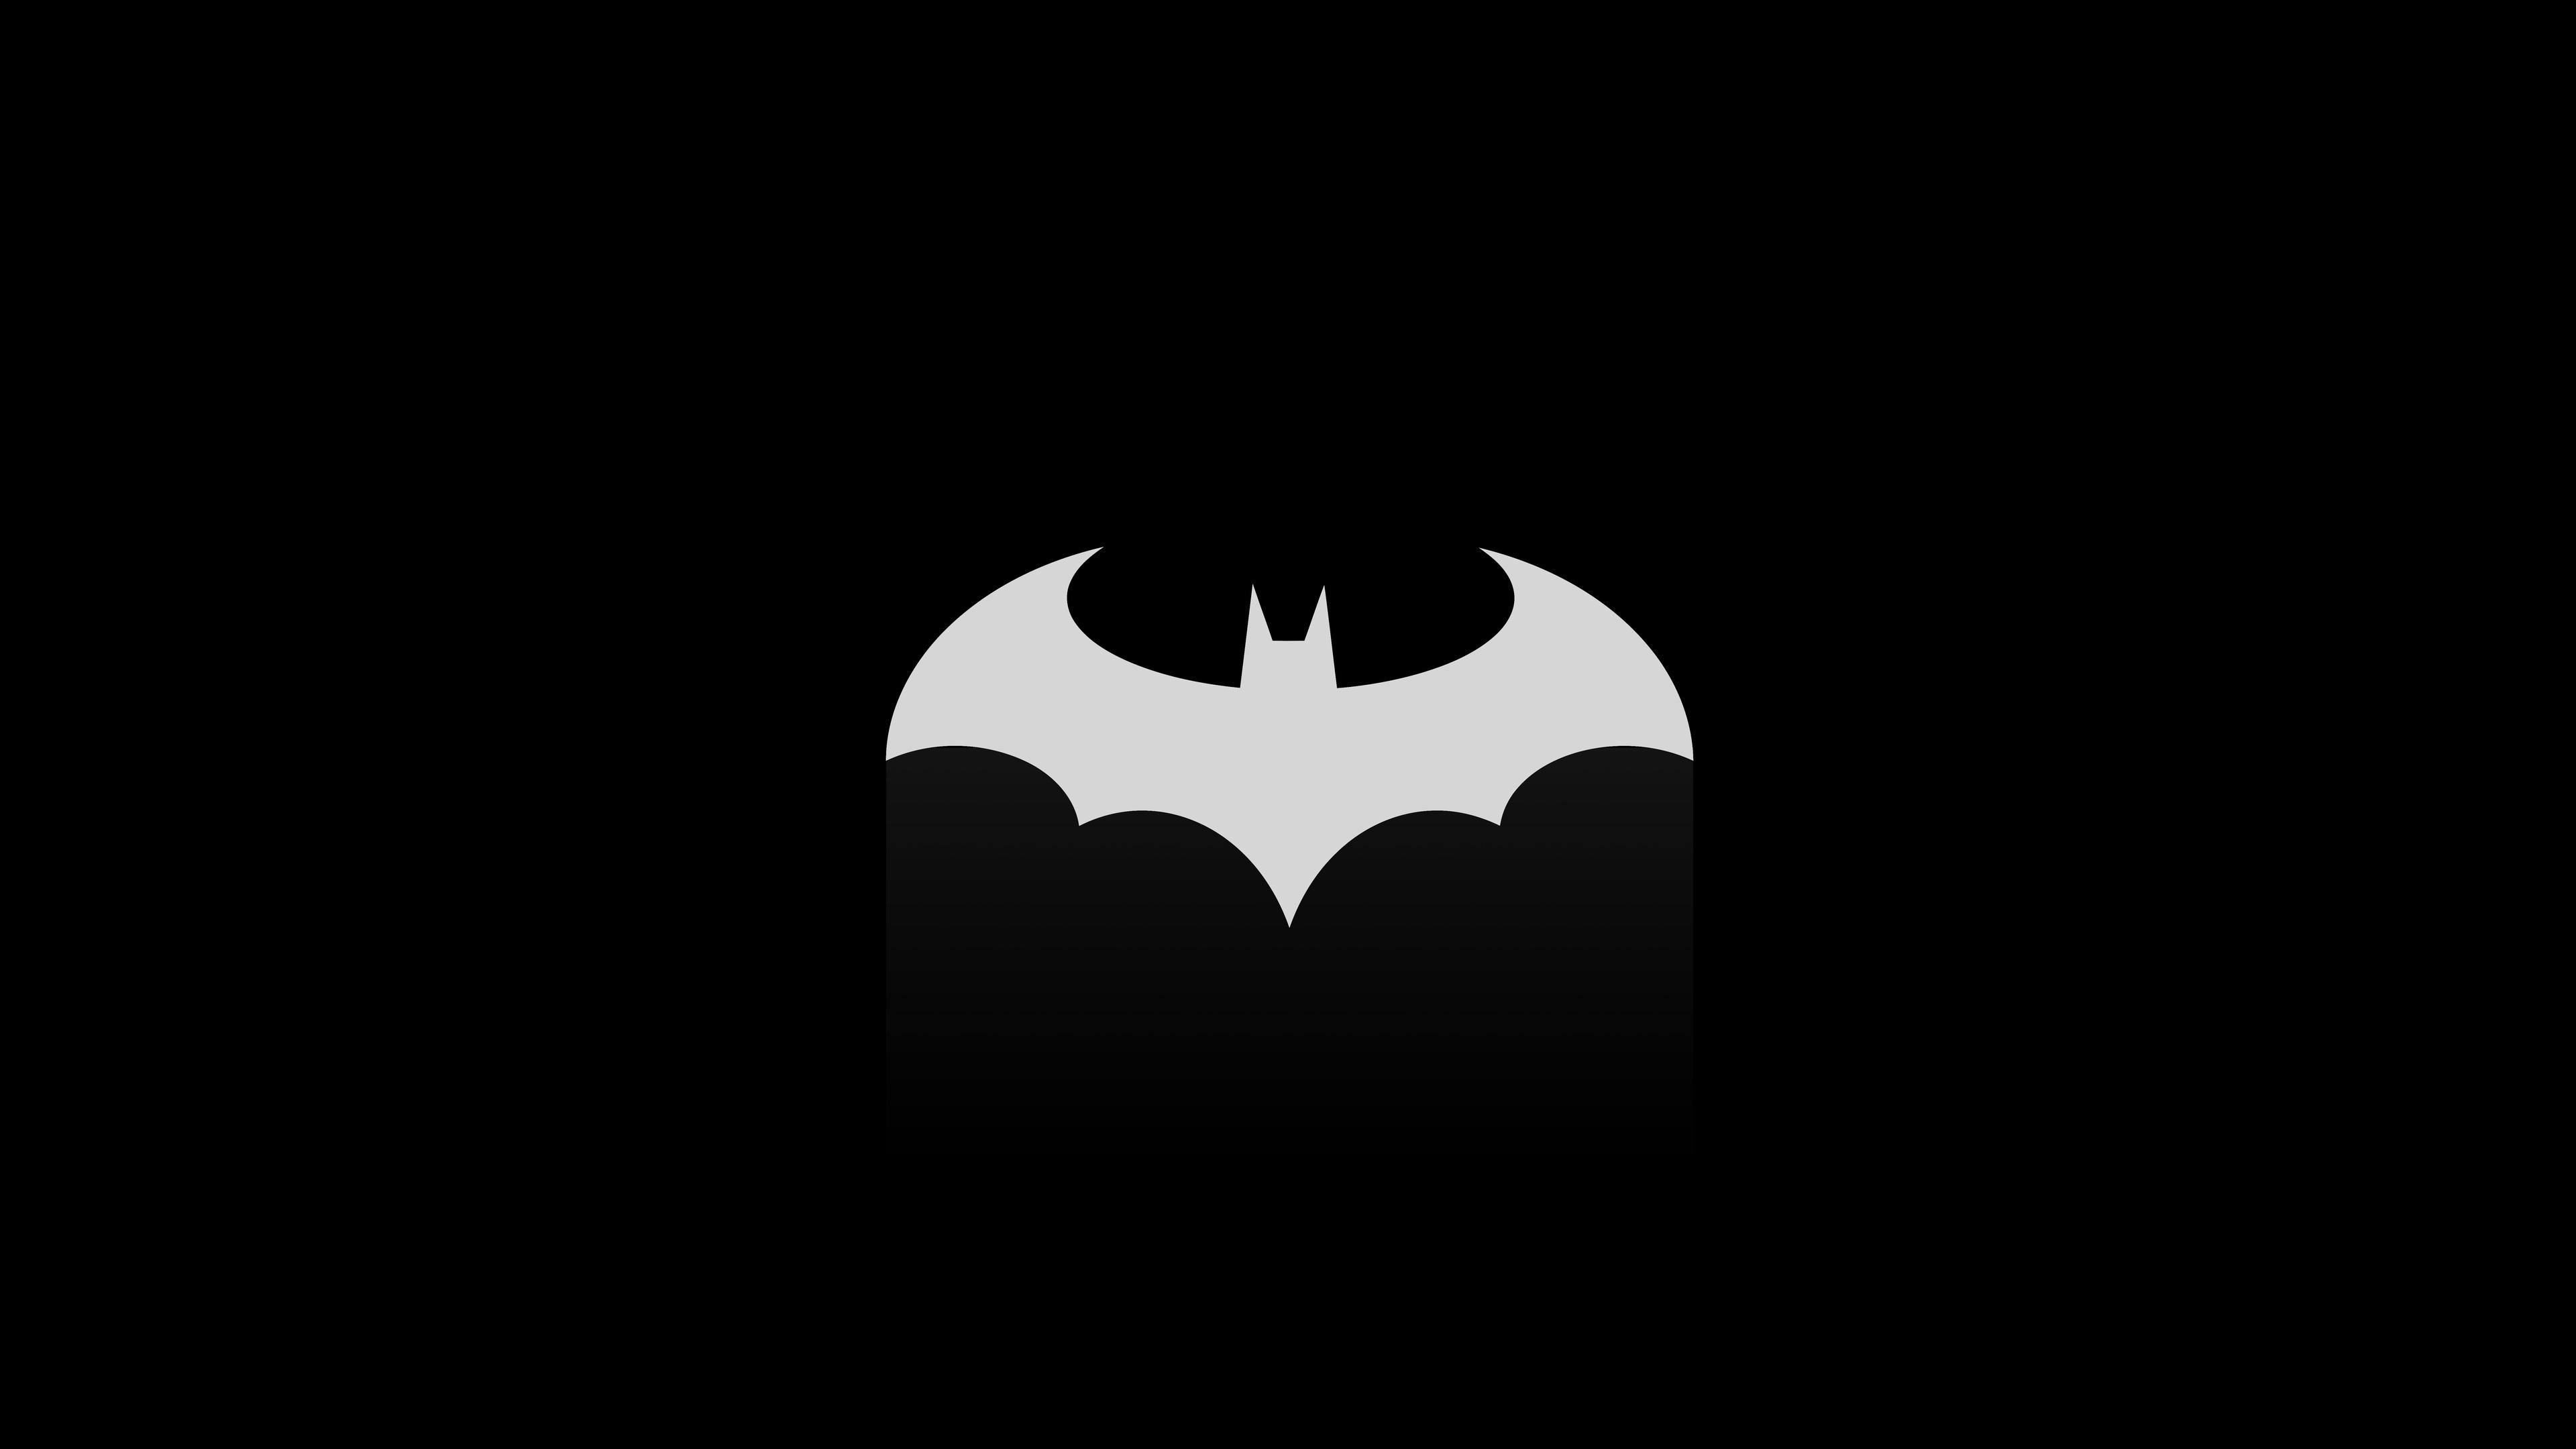 Wallpaper 4k Batman Logo 10k 10k Wallpapers 4k Wallpapers